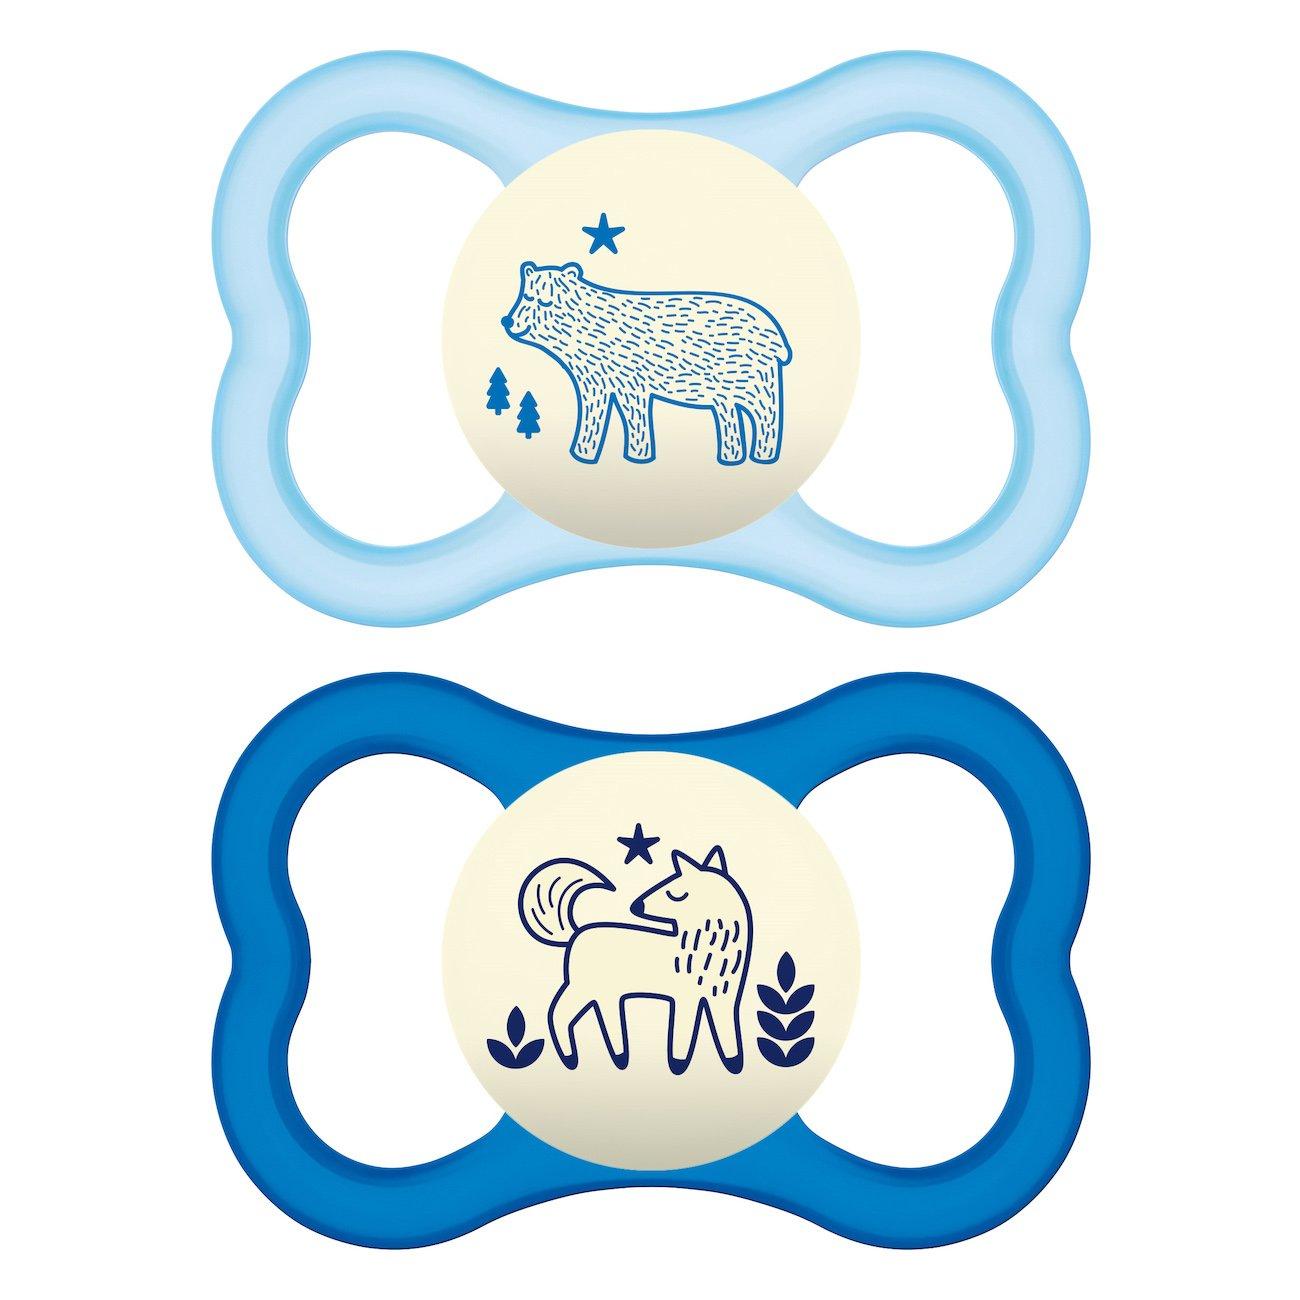 Mam Air Night Animal Ορθοδοντική Πιπίλα Σιλικόνης που Λάμπει στο Σκοτάδι Κωδ 277S από 16+ Μηνών 2 Τεμάχια – Γαλάζιο – Μπλε